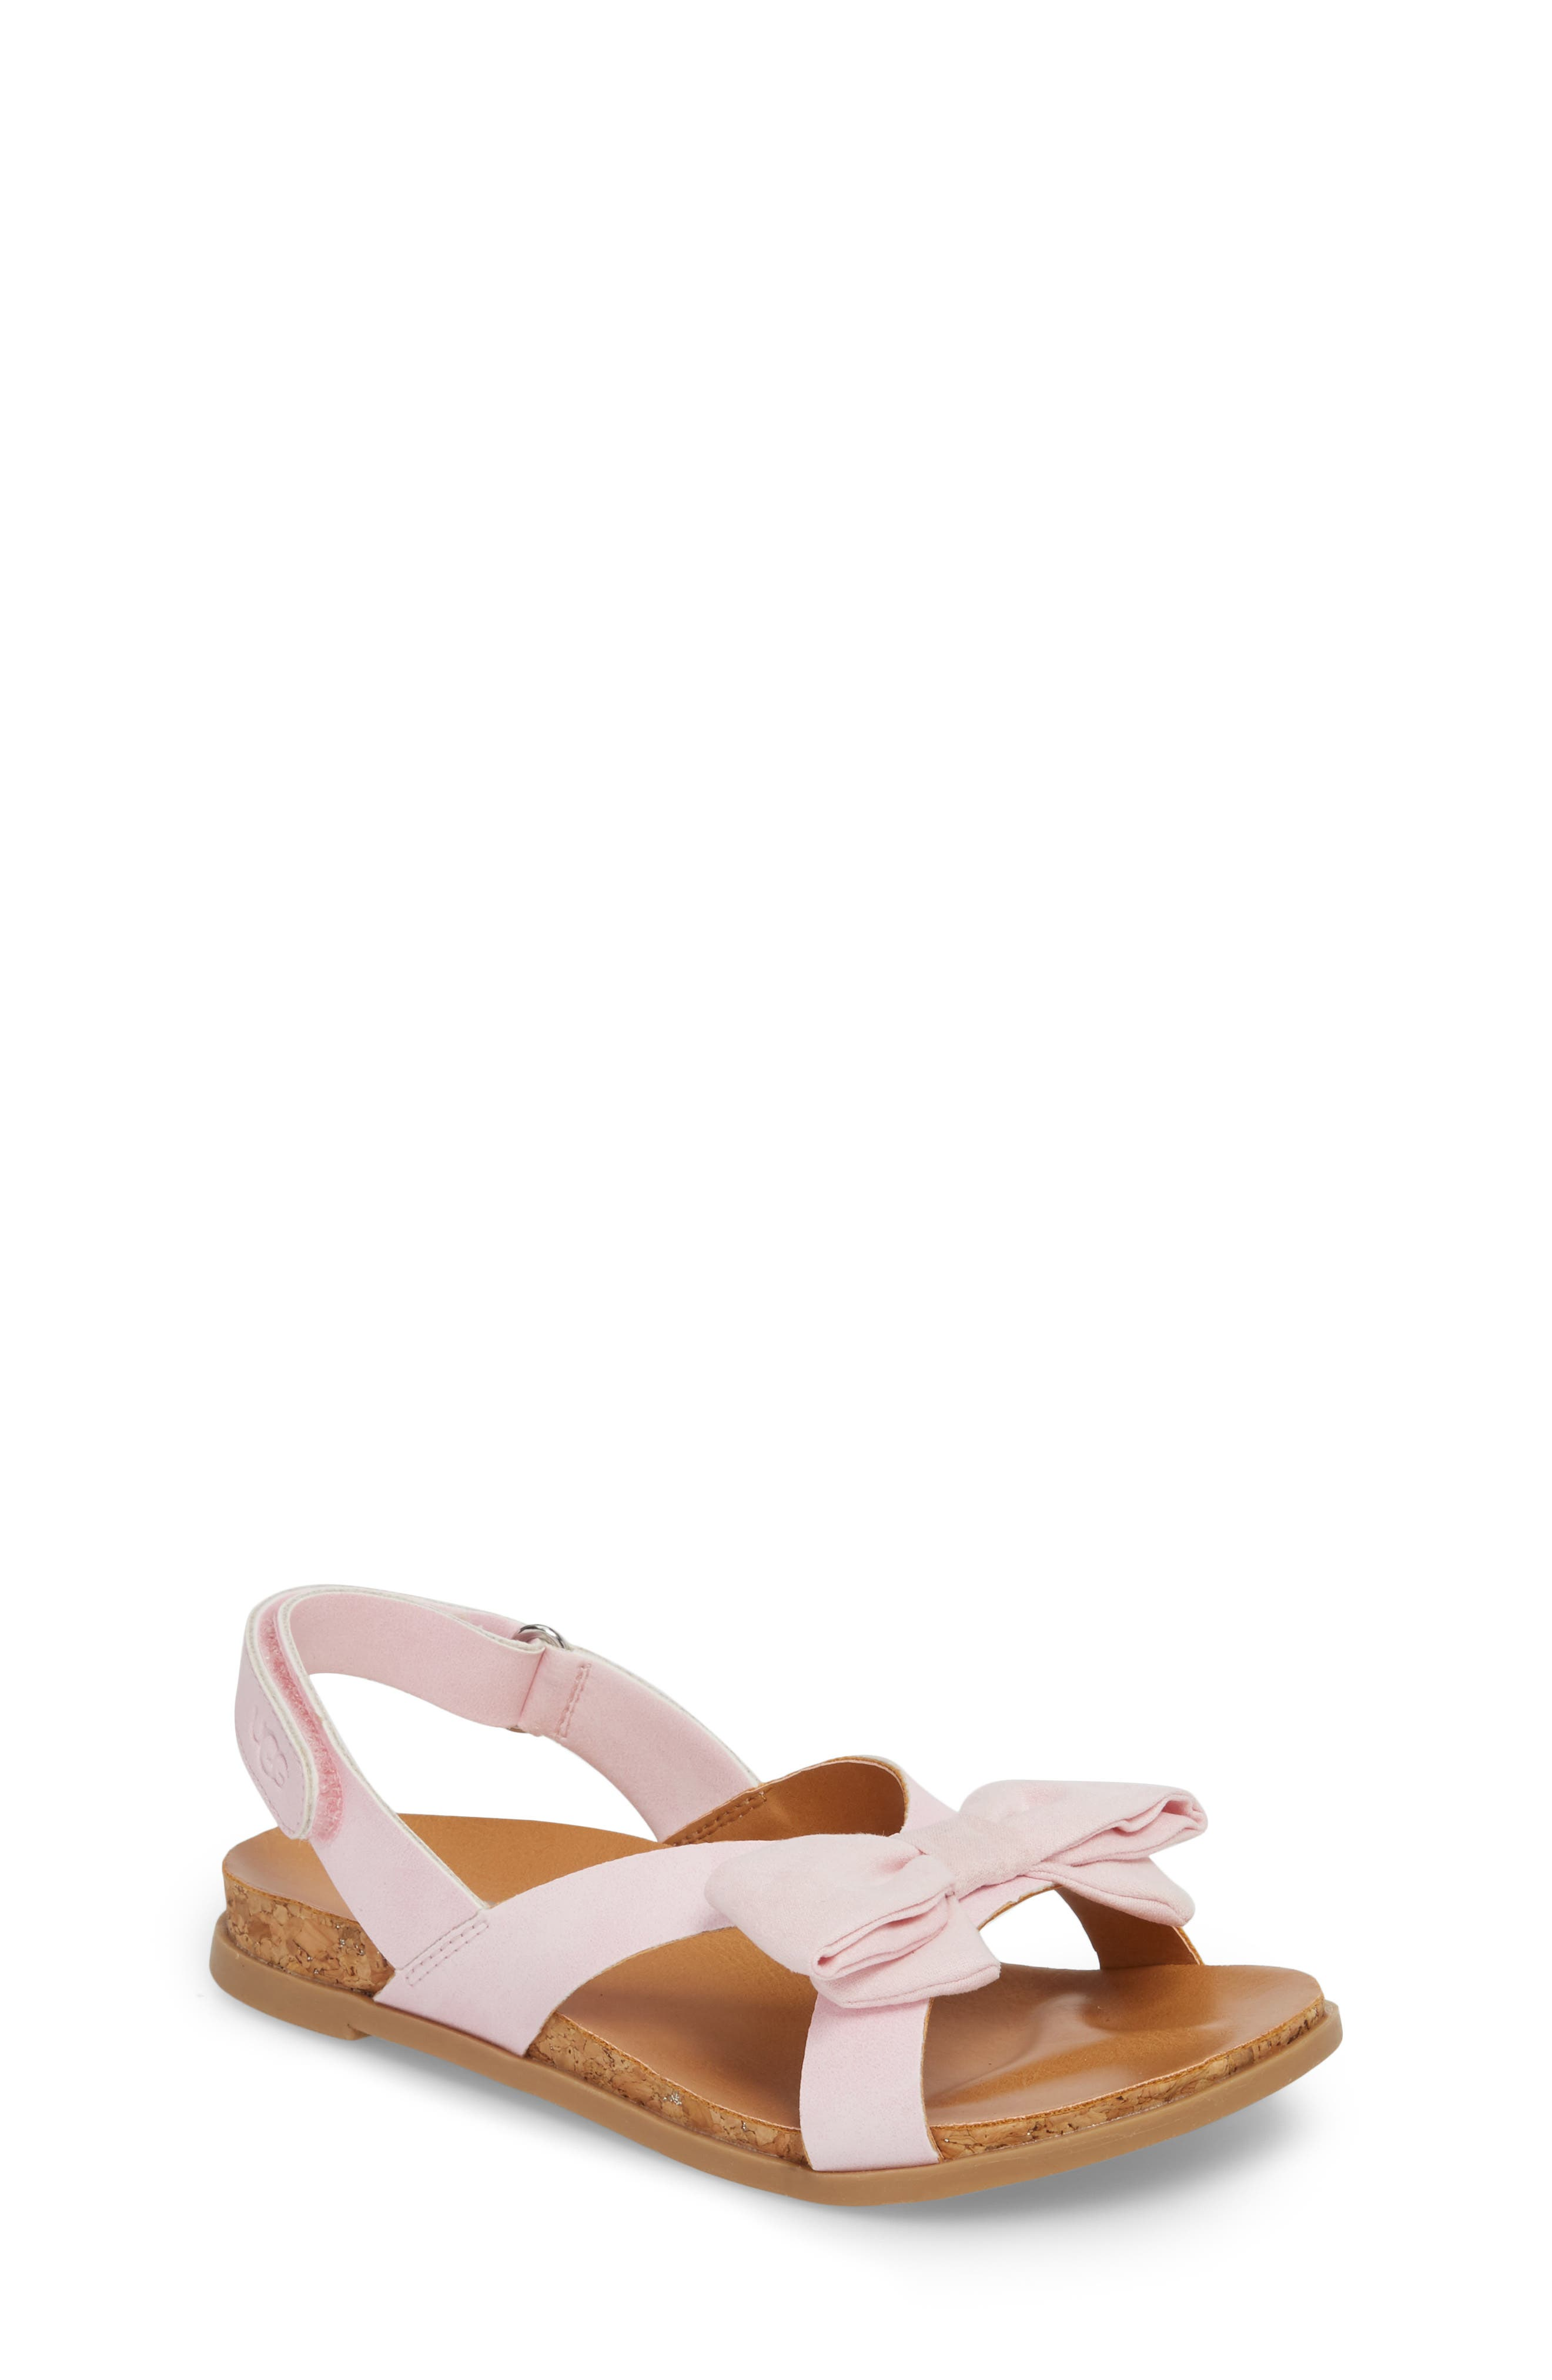 Fonda Sandal,                             Main thumbnail 1, color,                             Seashell Pink